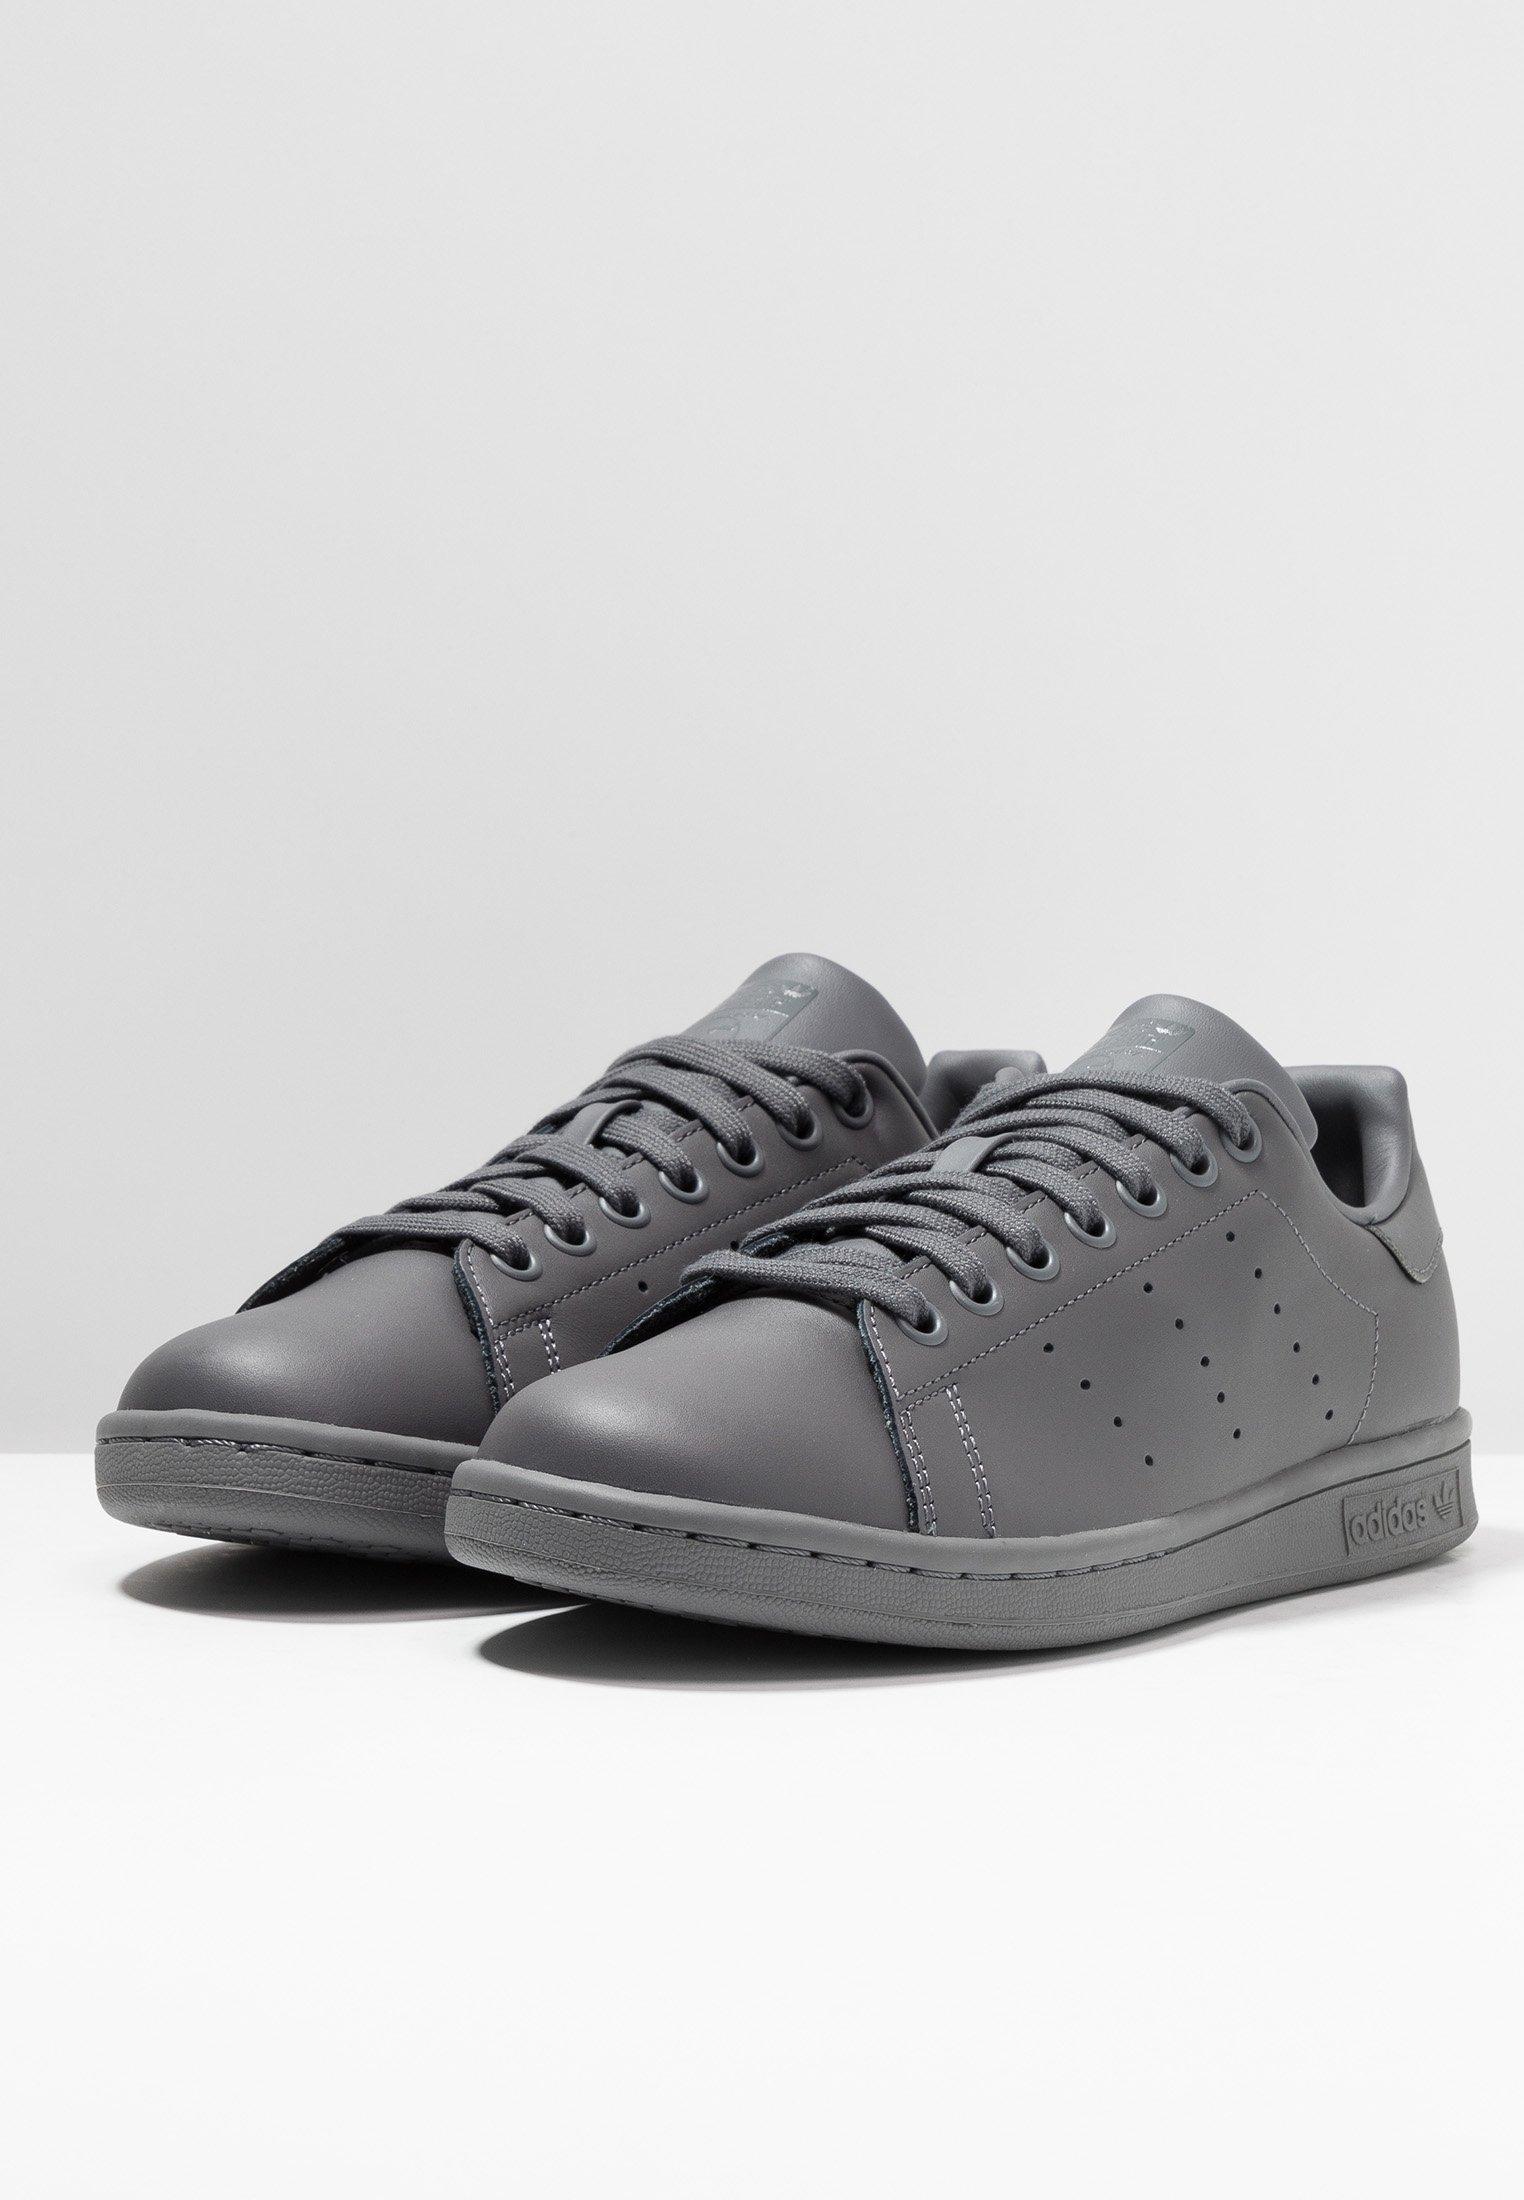 Stan SmithBaskets Five Adidas Originals Basses Grey EDeHW29IY